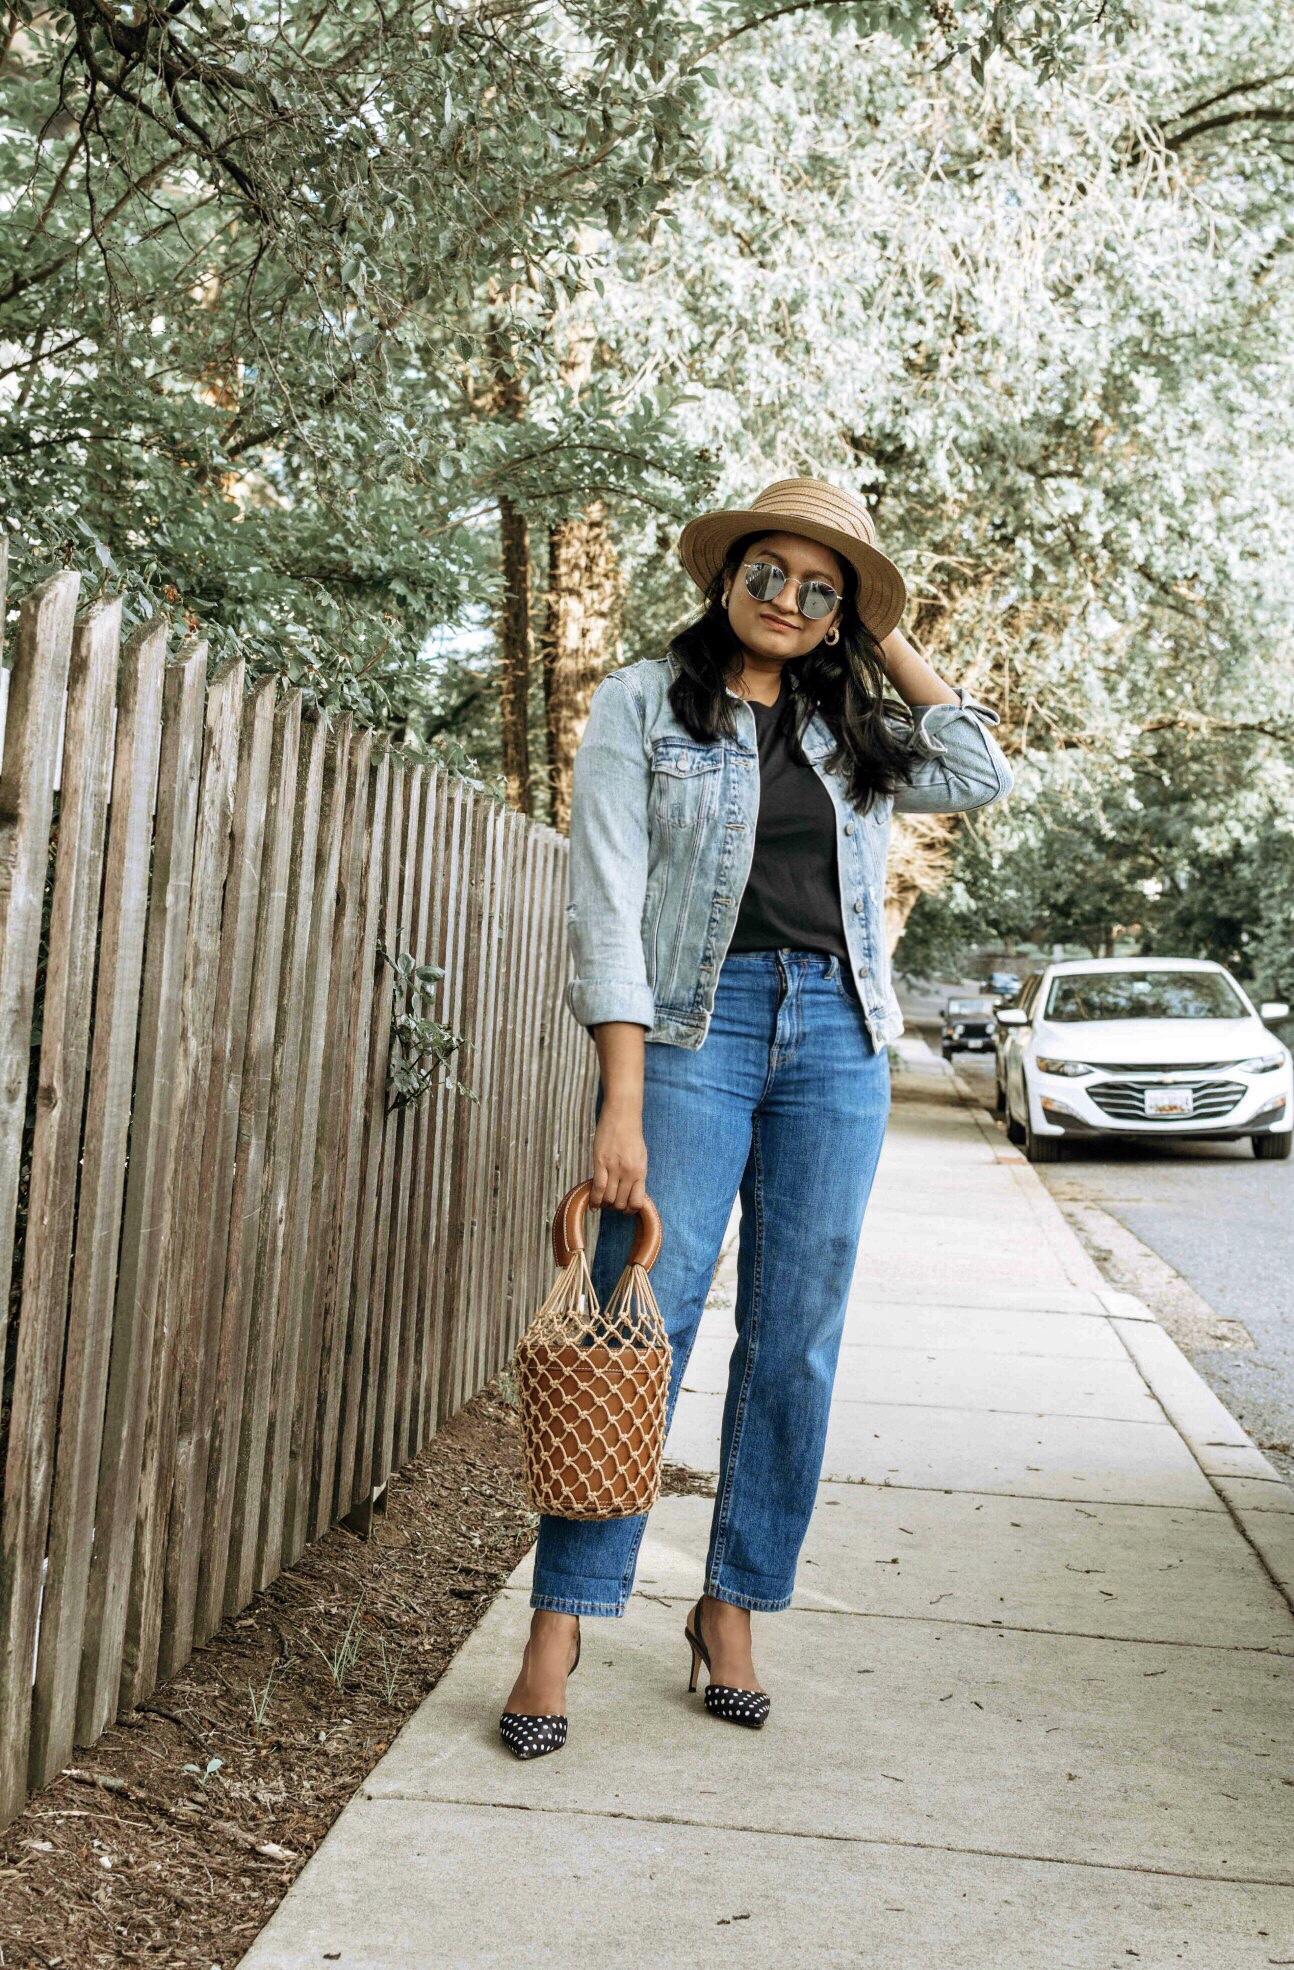 Wearing Everlane summer jeans, Cotton Box-Cut Tee,polka dot pumps, STAUD Moreau Bag 8